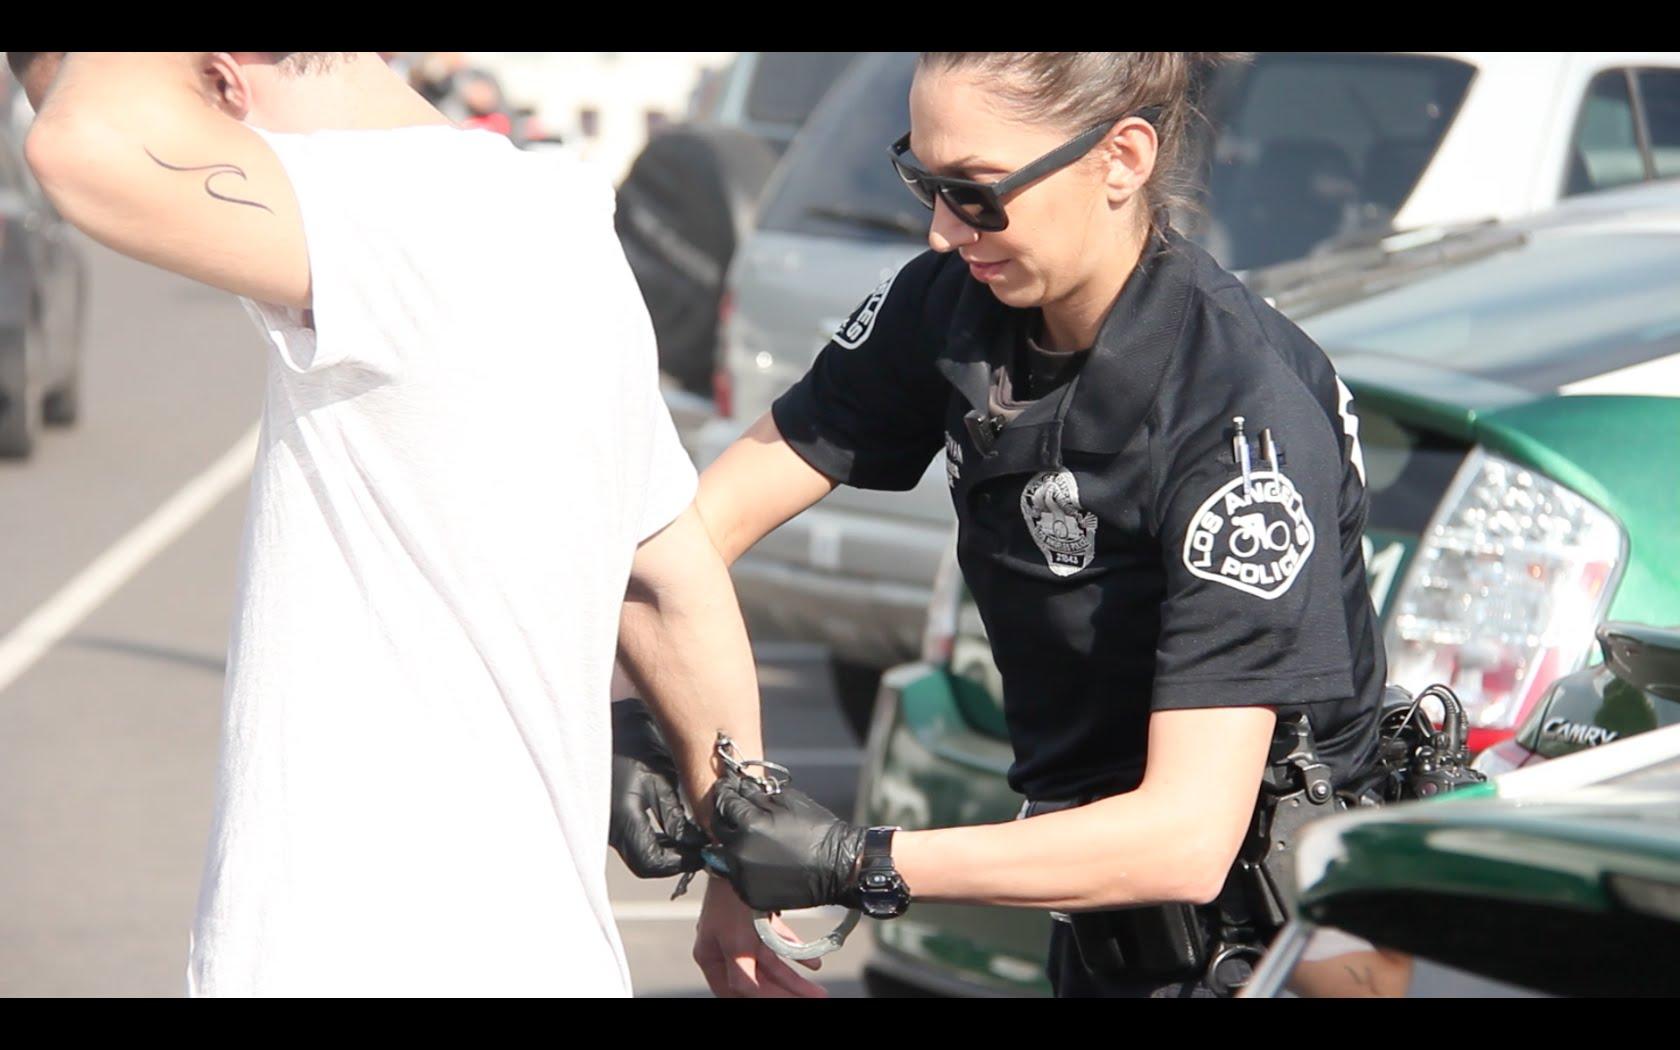 Да преметнеш полицаи с кока (ВИДЕО)